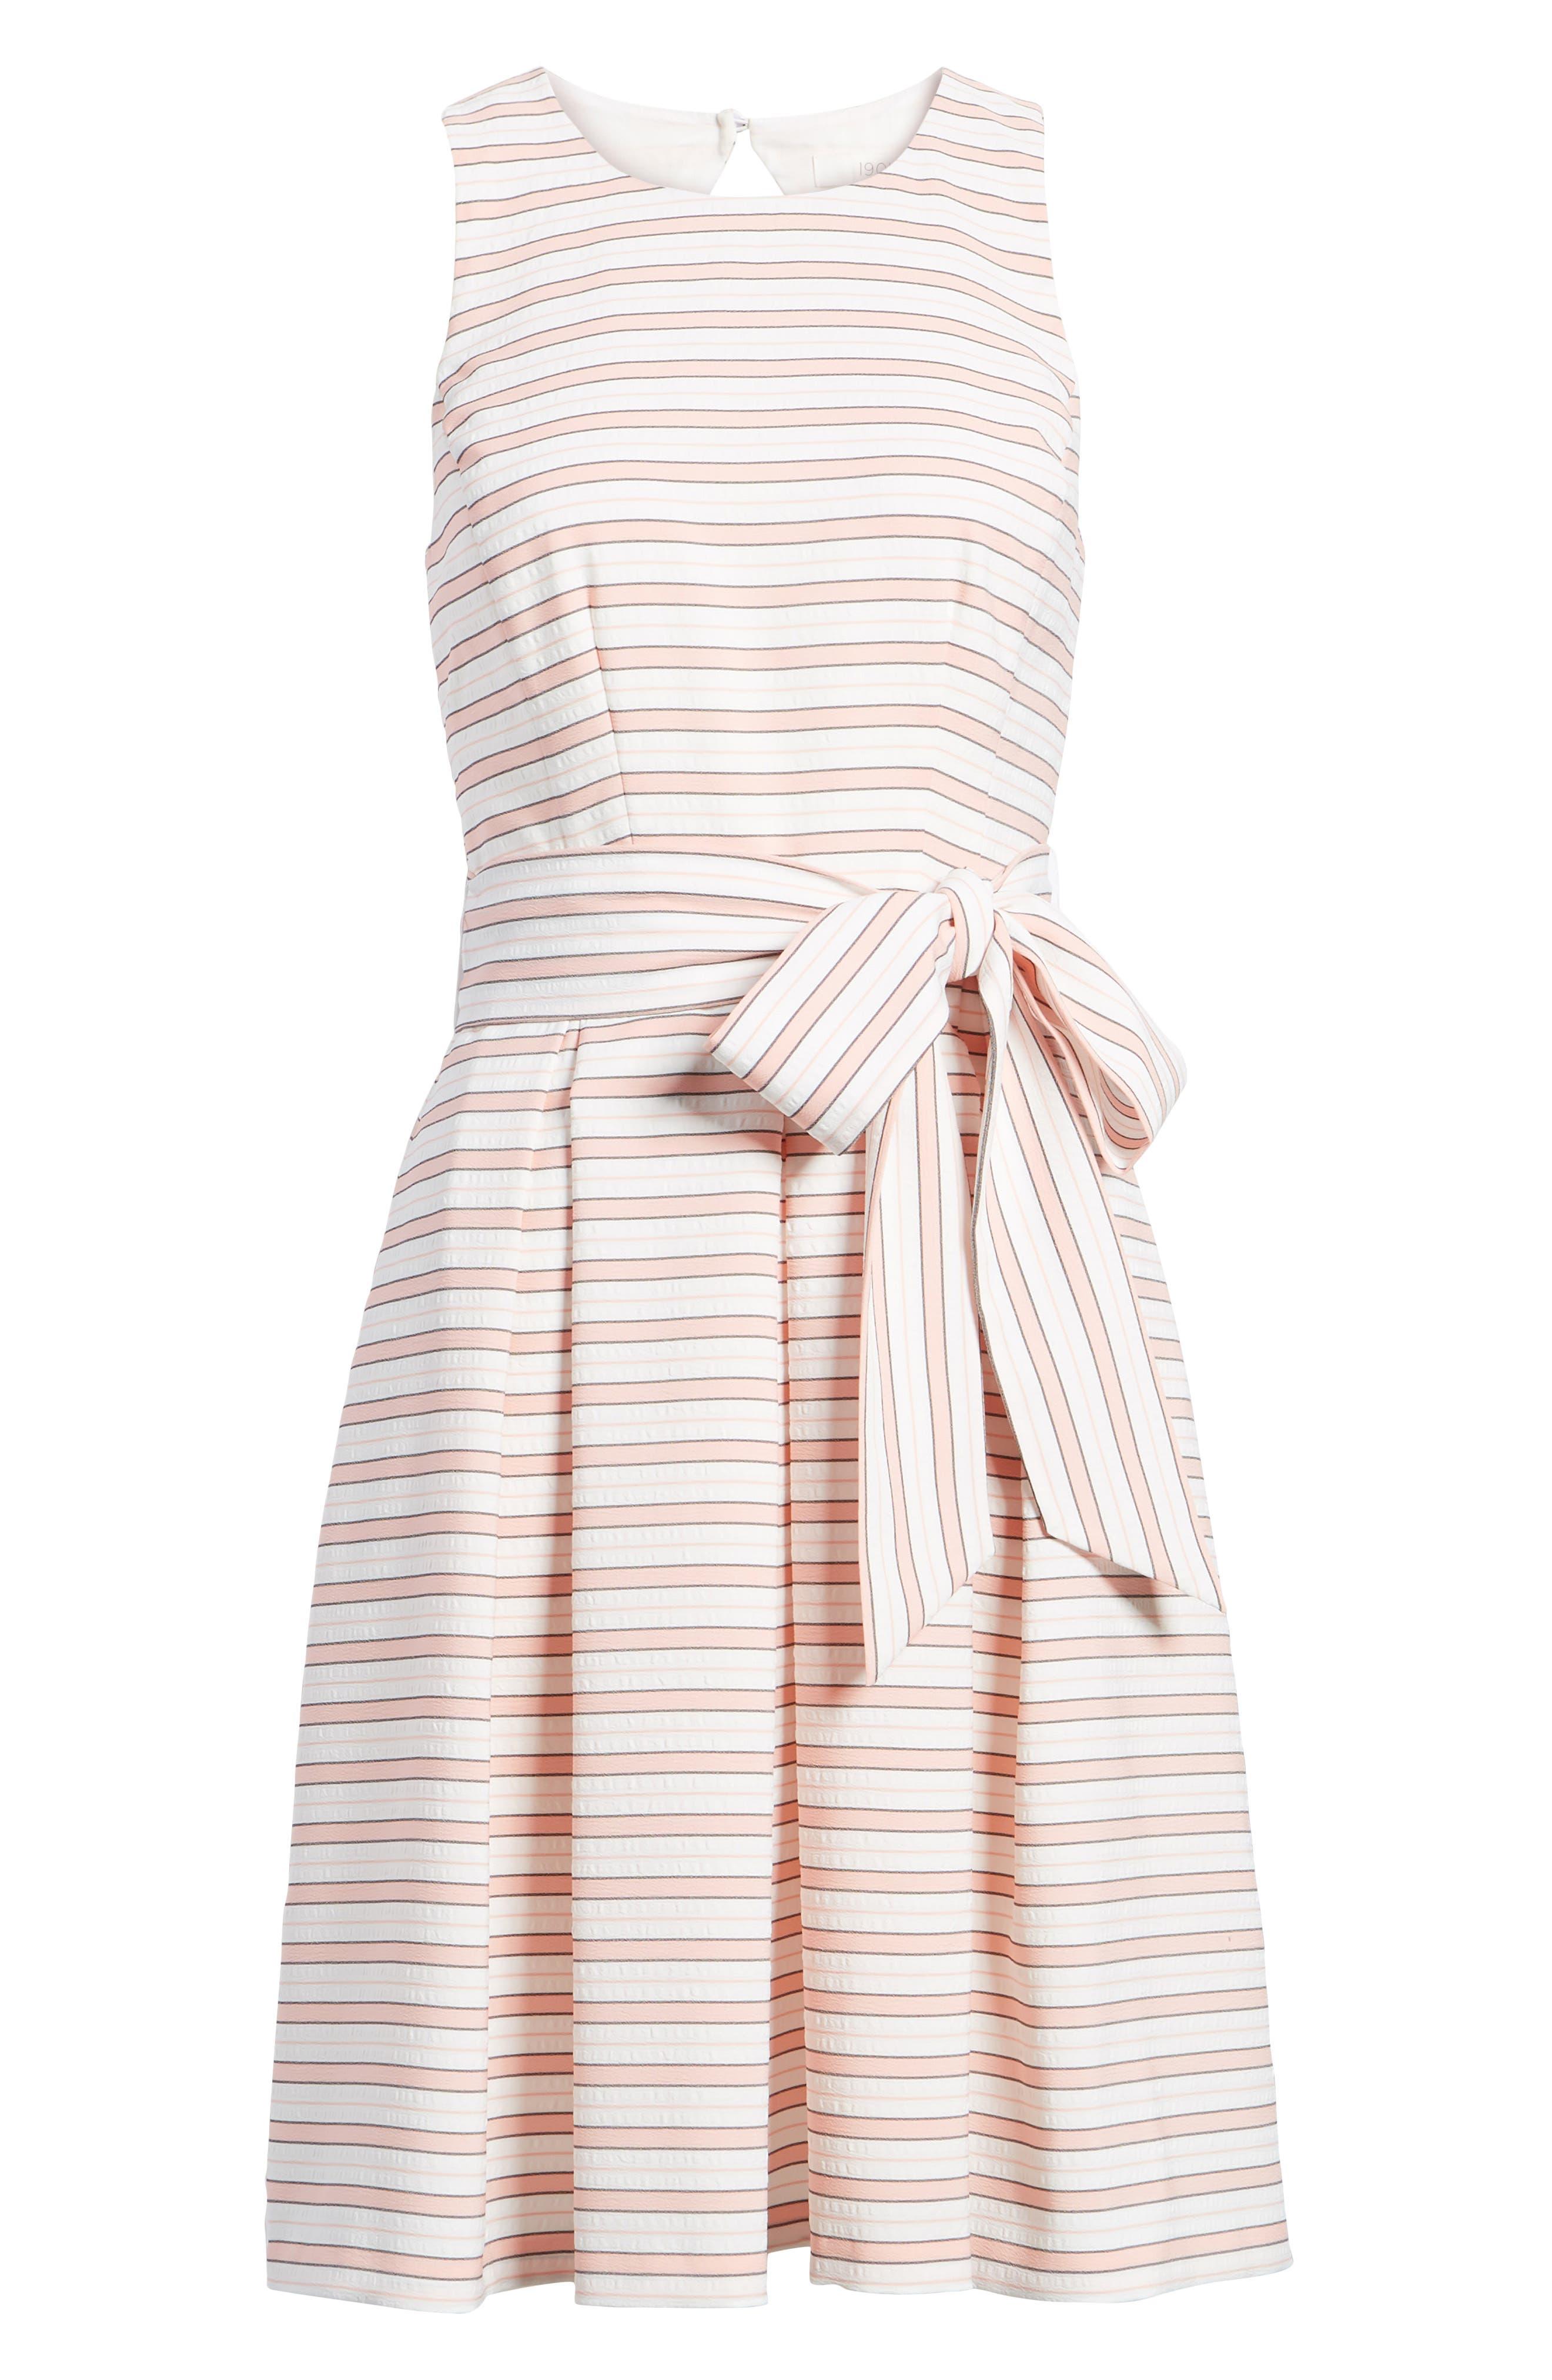 Stripe Tie Waist Dress,                             Alternate thumbnail 7, color,                             Pink Stripe